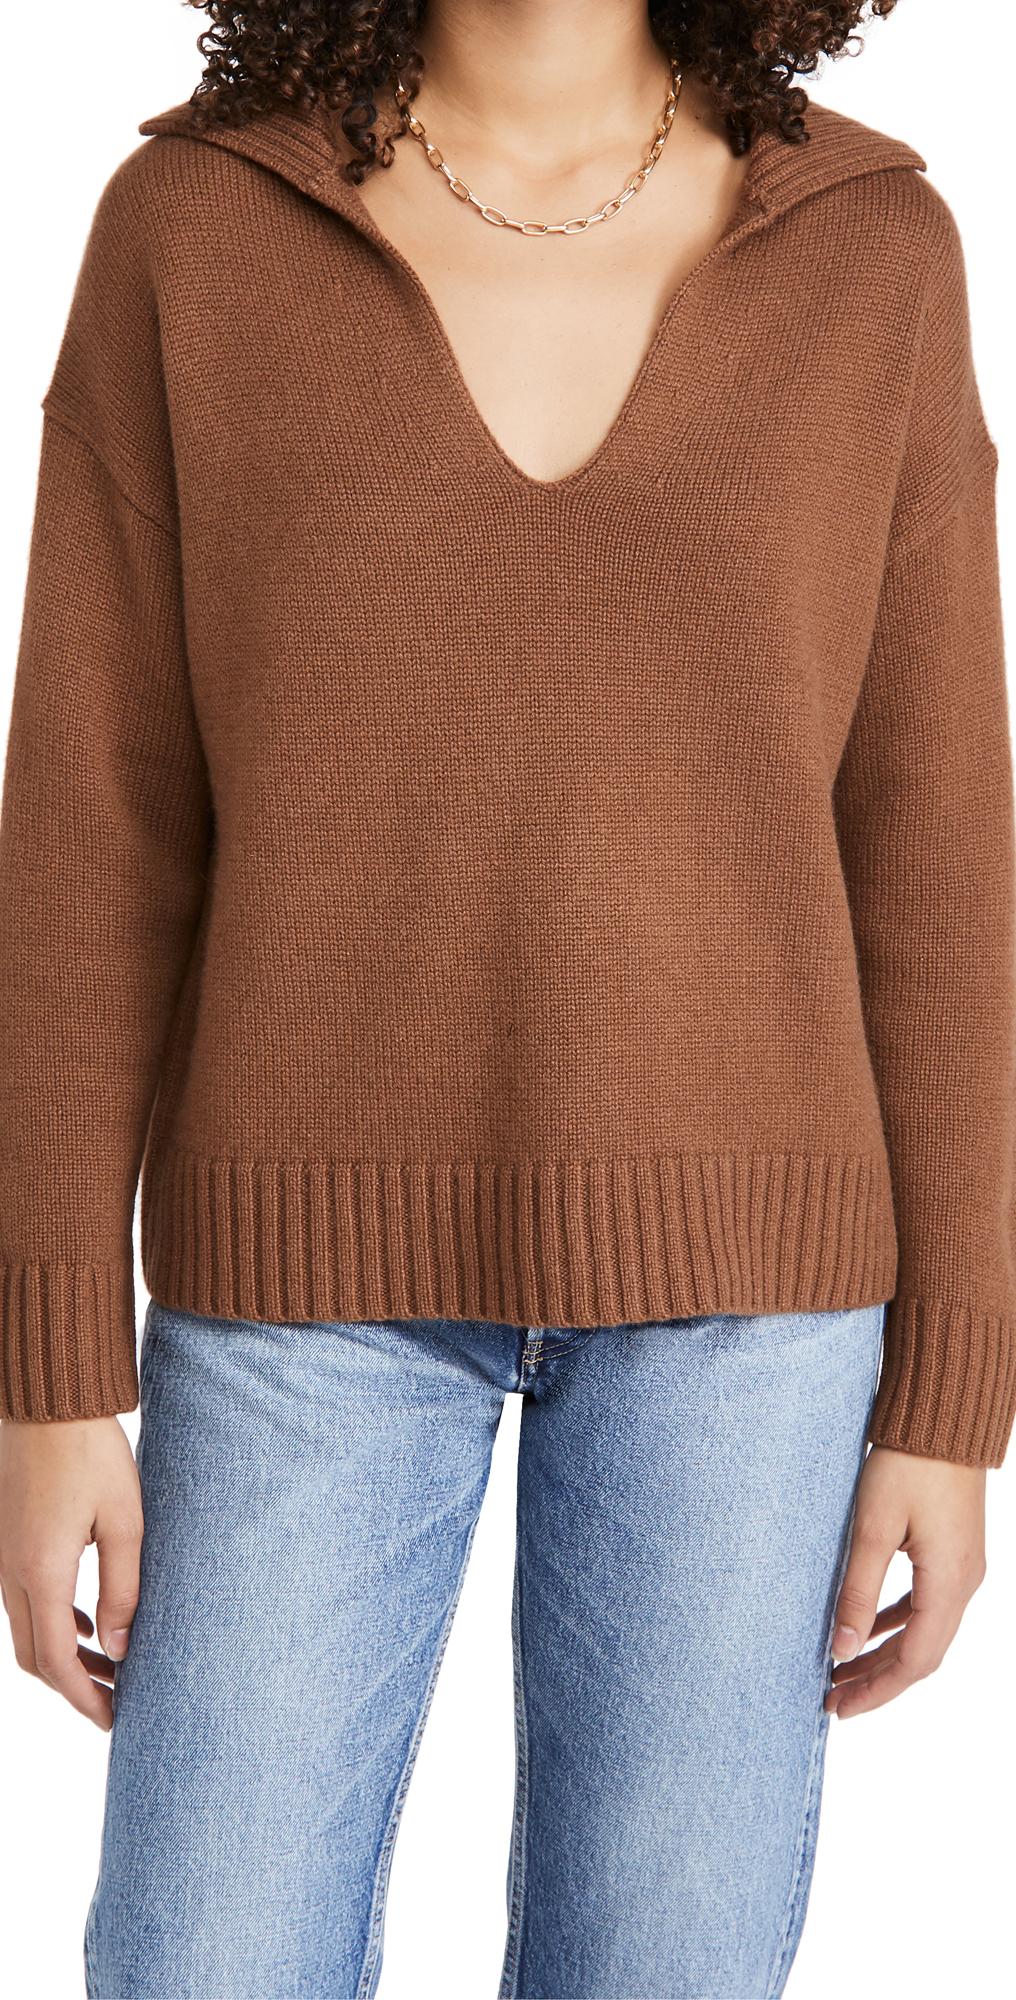 Nili Lotan Julie Cashmere Sweater